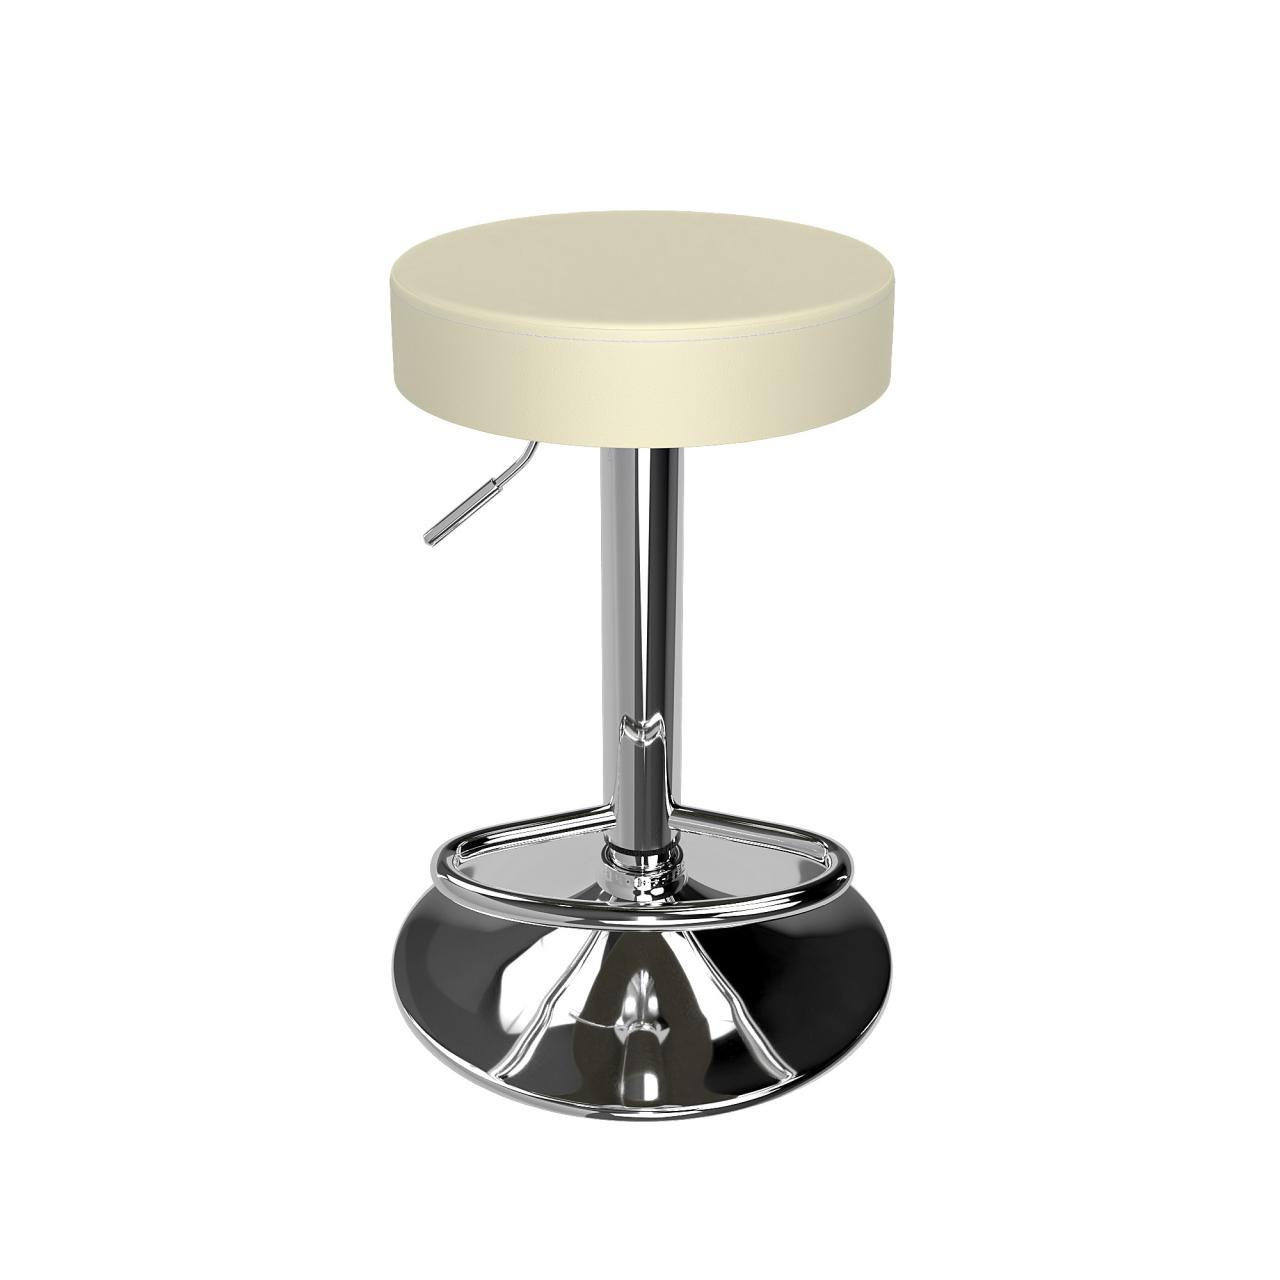 2er barhocker set barst hle tresenhocker k chenhocker thekenhocker bistrohocker ebay. Black Bedroom Furniture Sets. Home Design Ideas